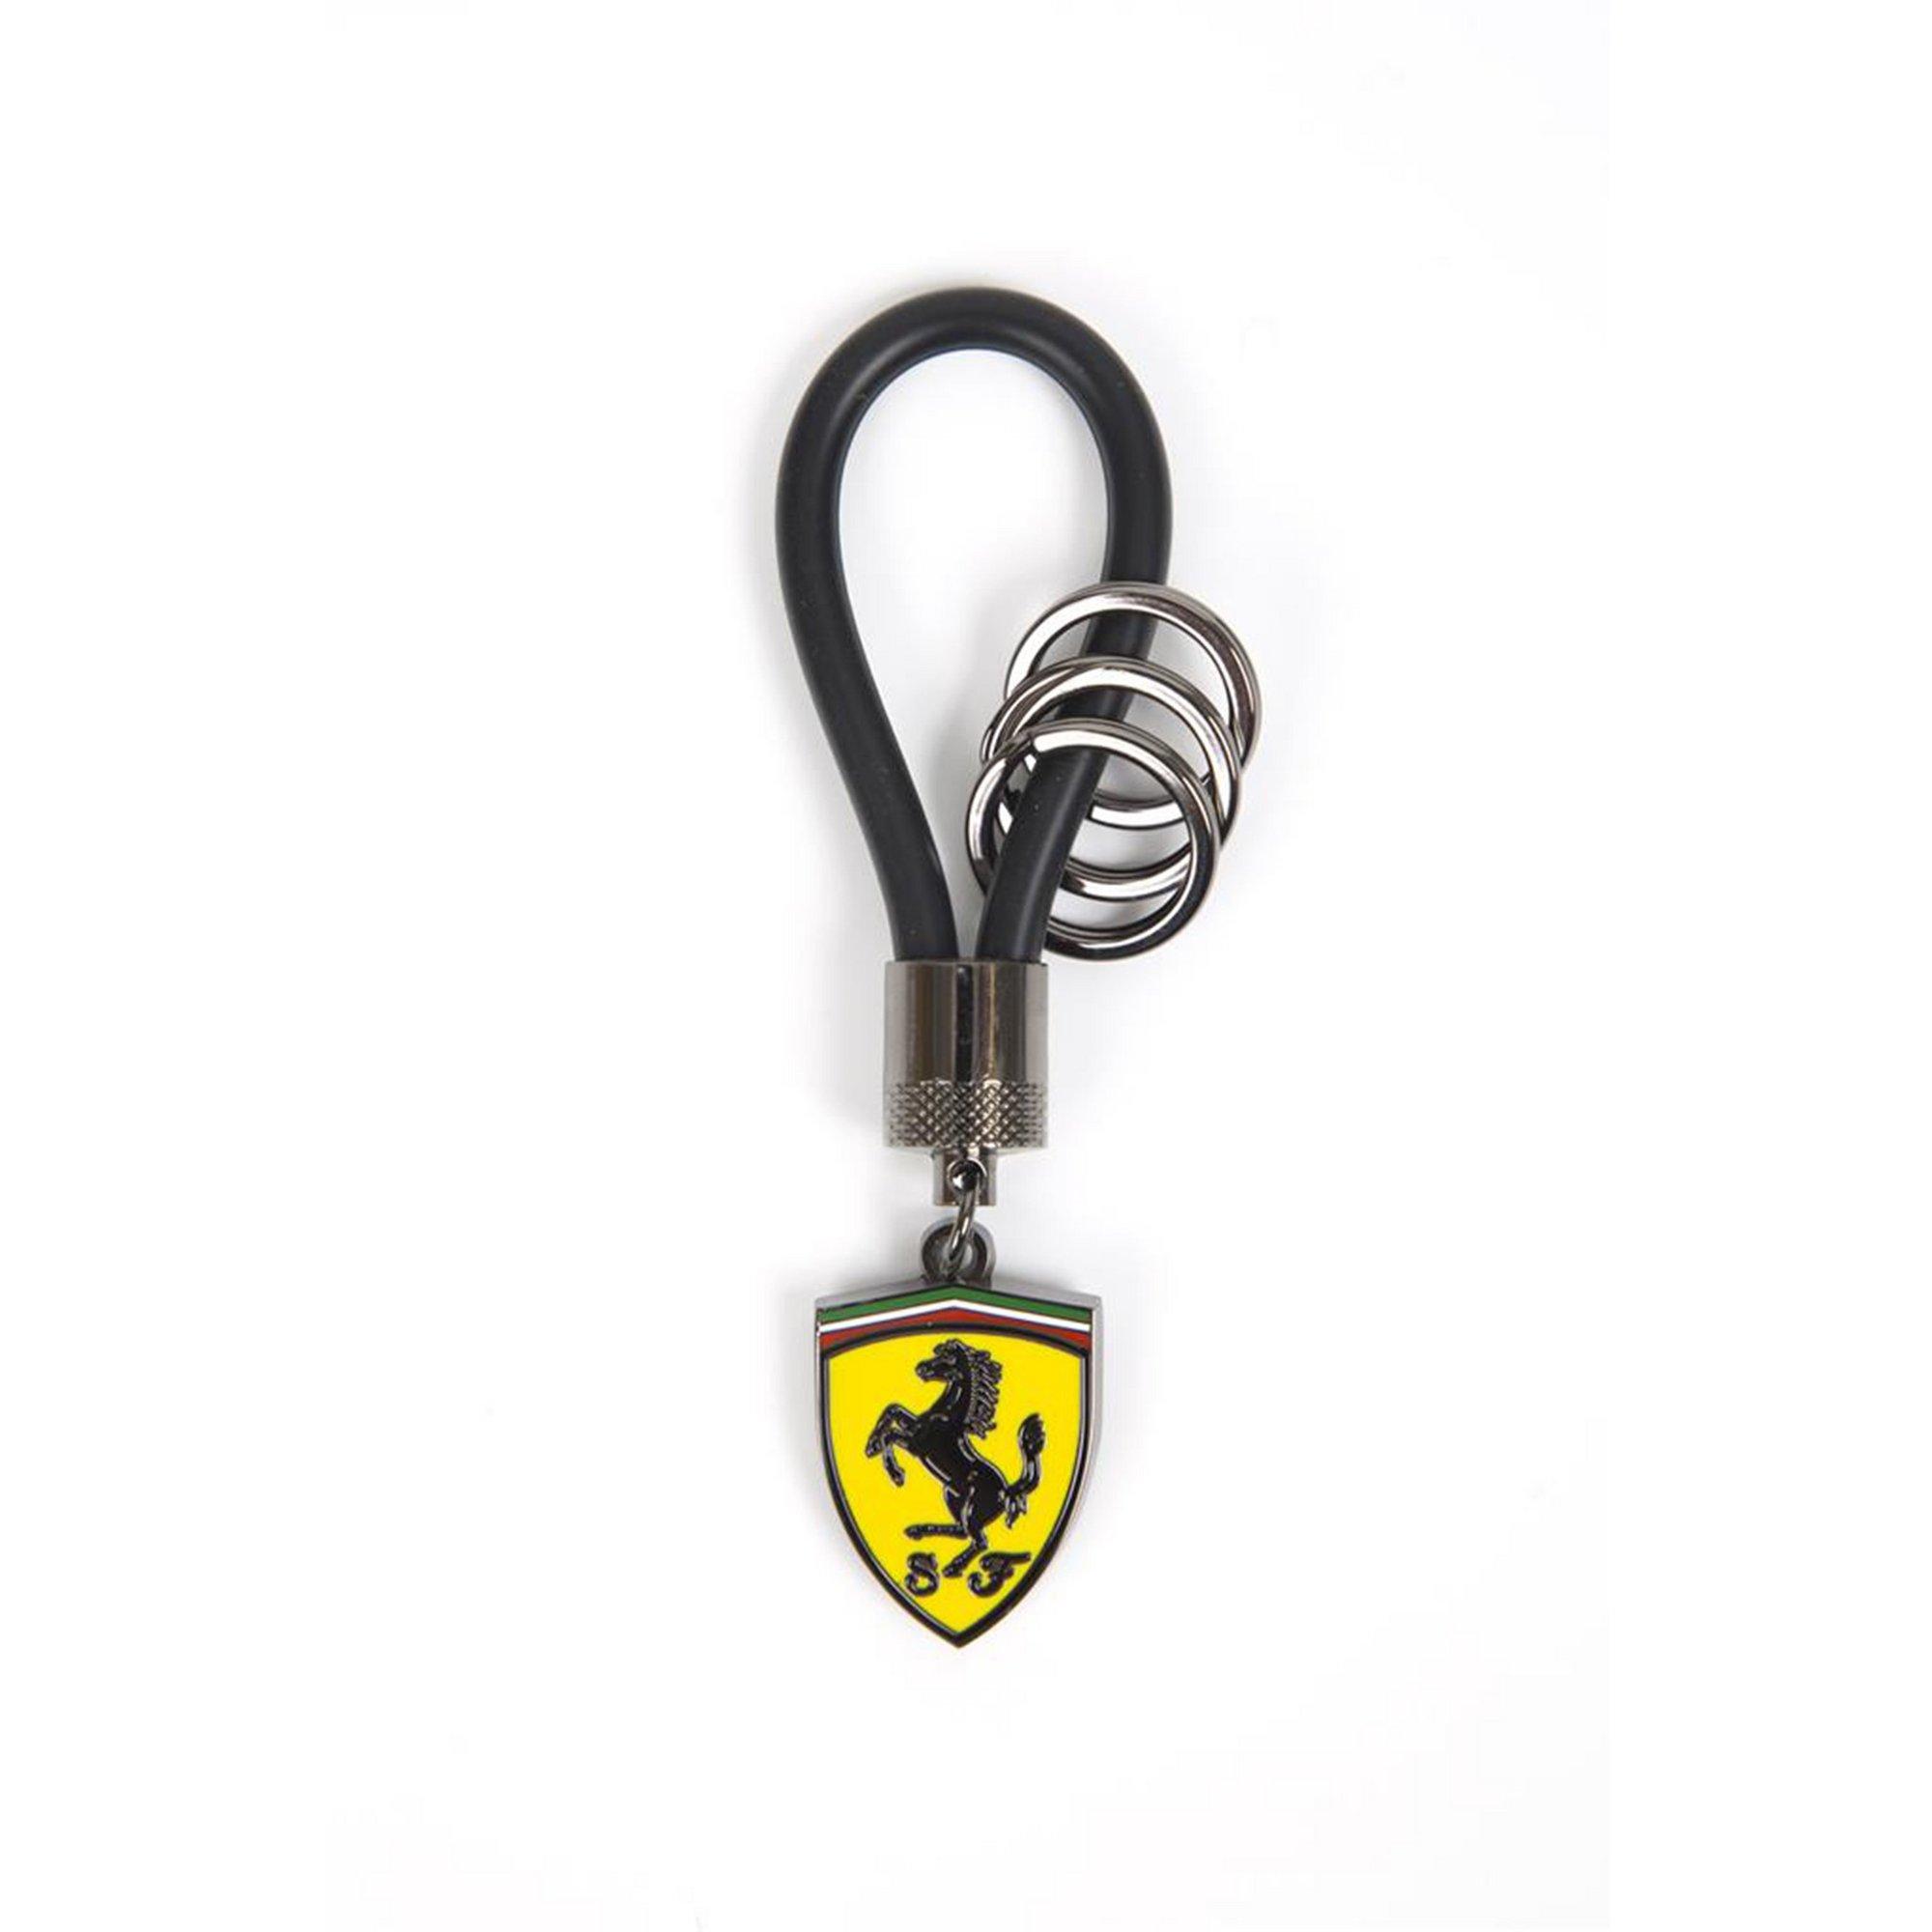 Image of Ferrari F1 Rubber Strap Keyring